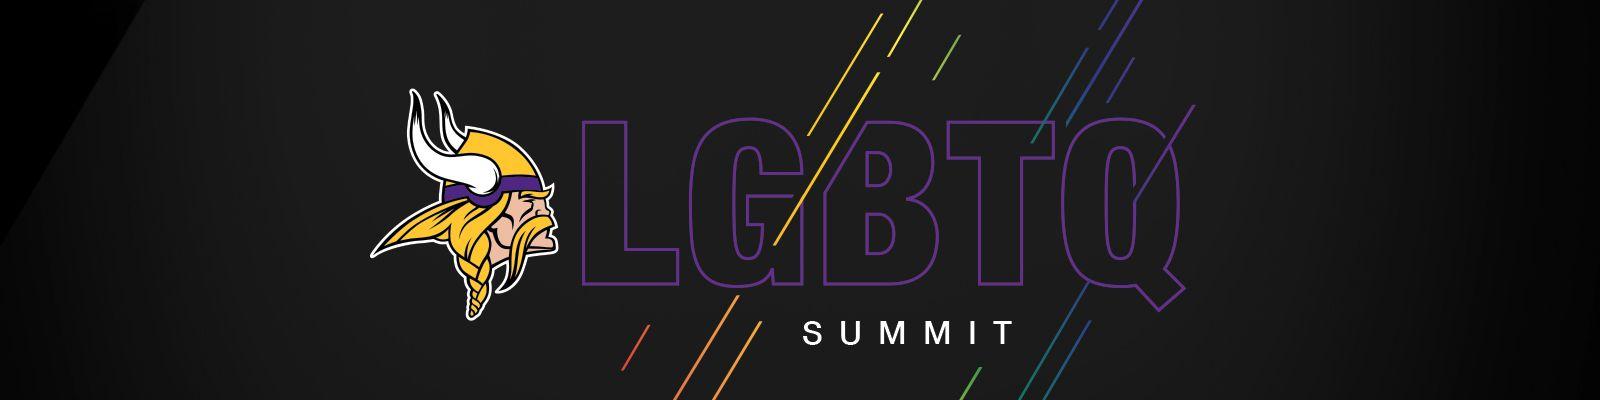 LGBTQ_Header_2_1600x400